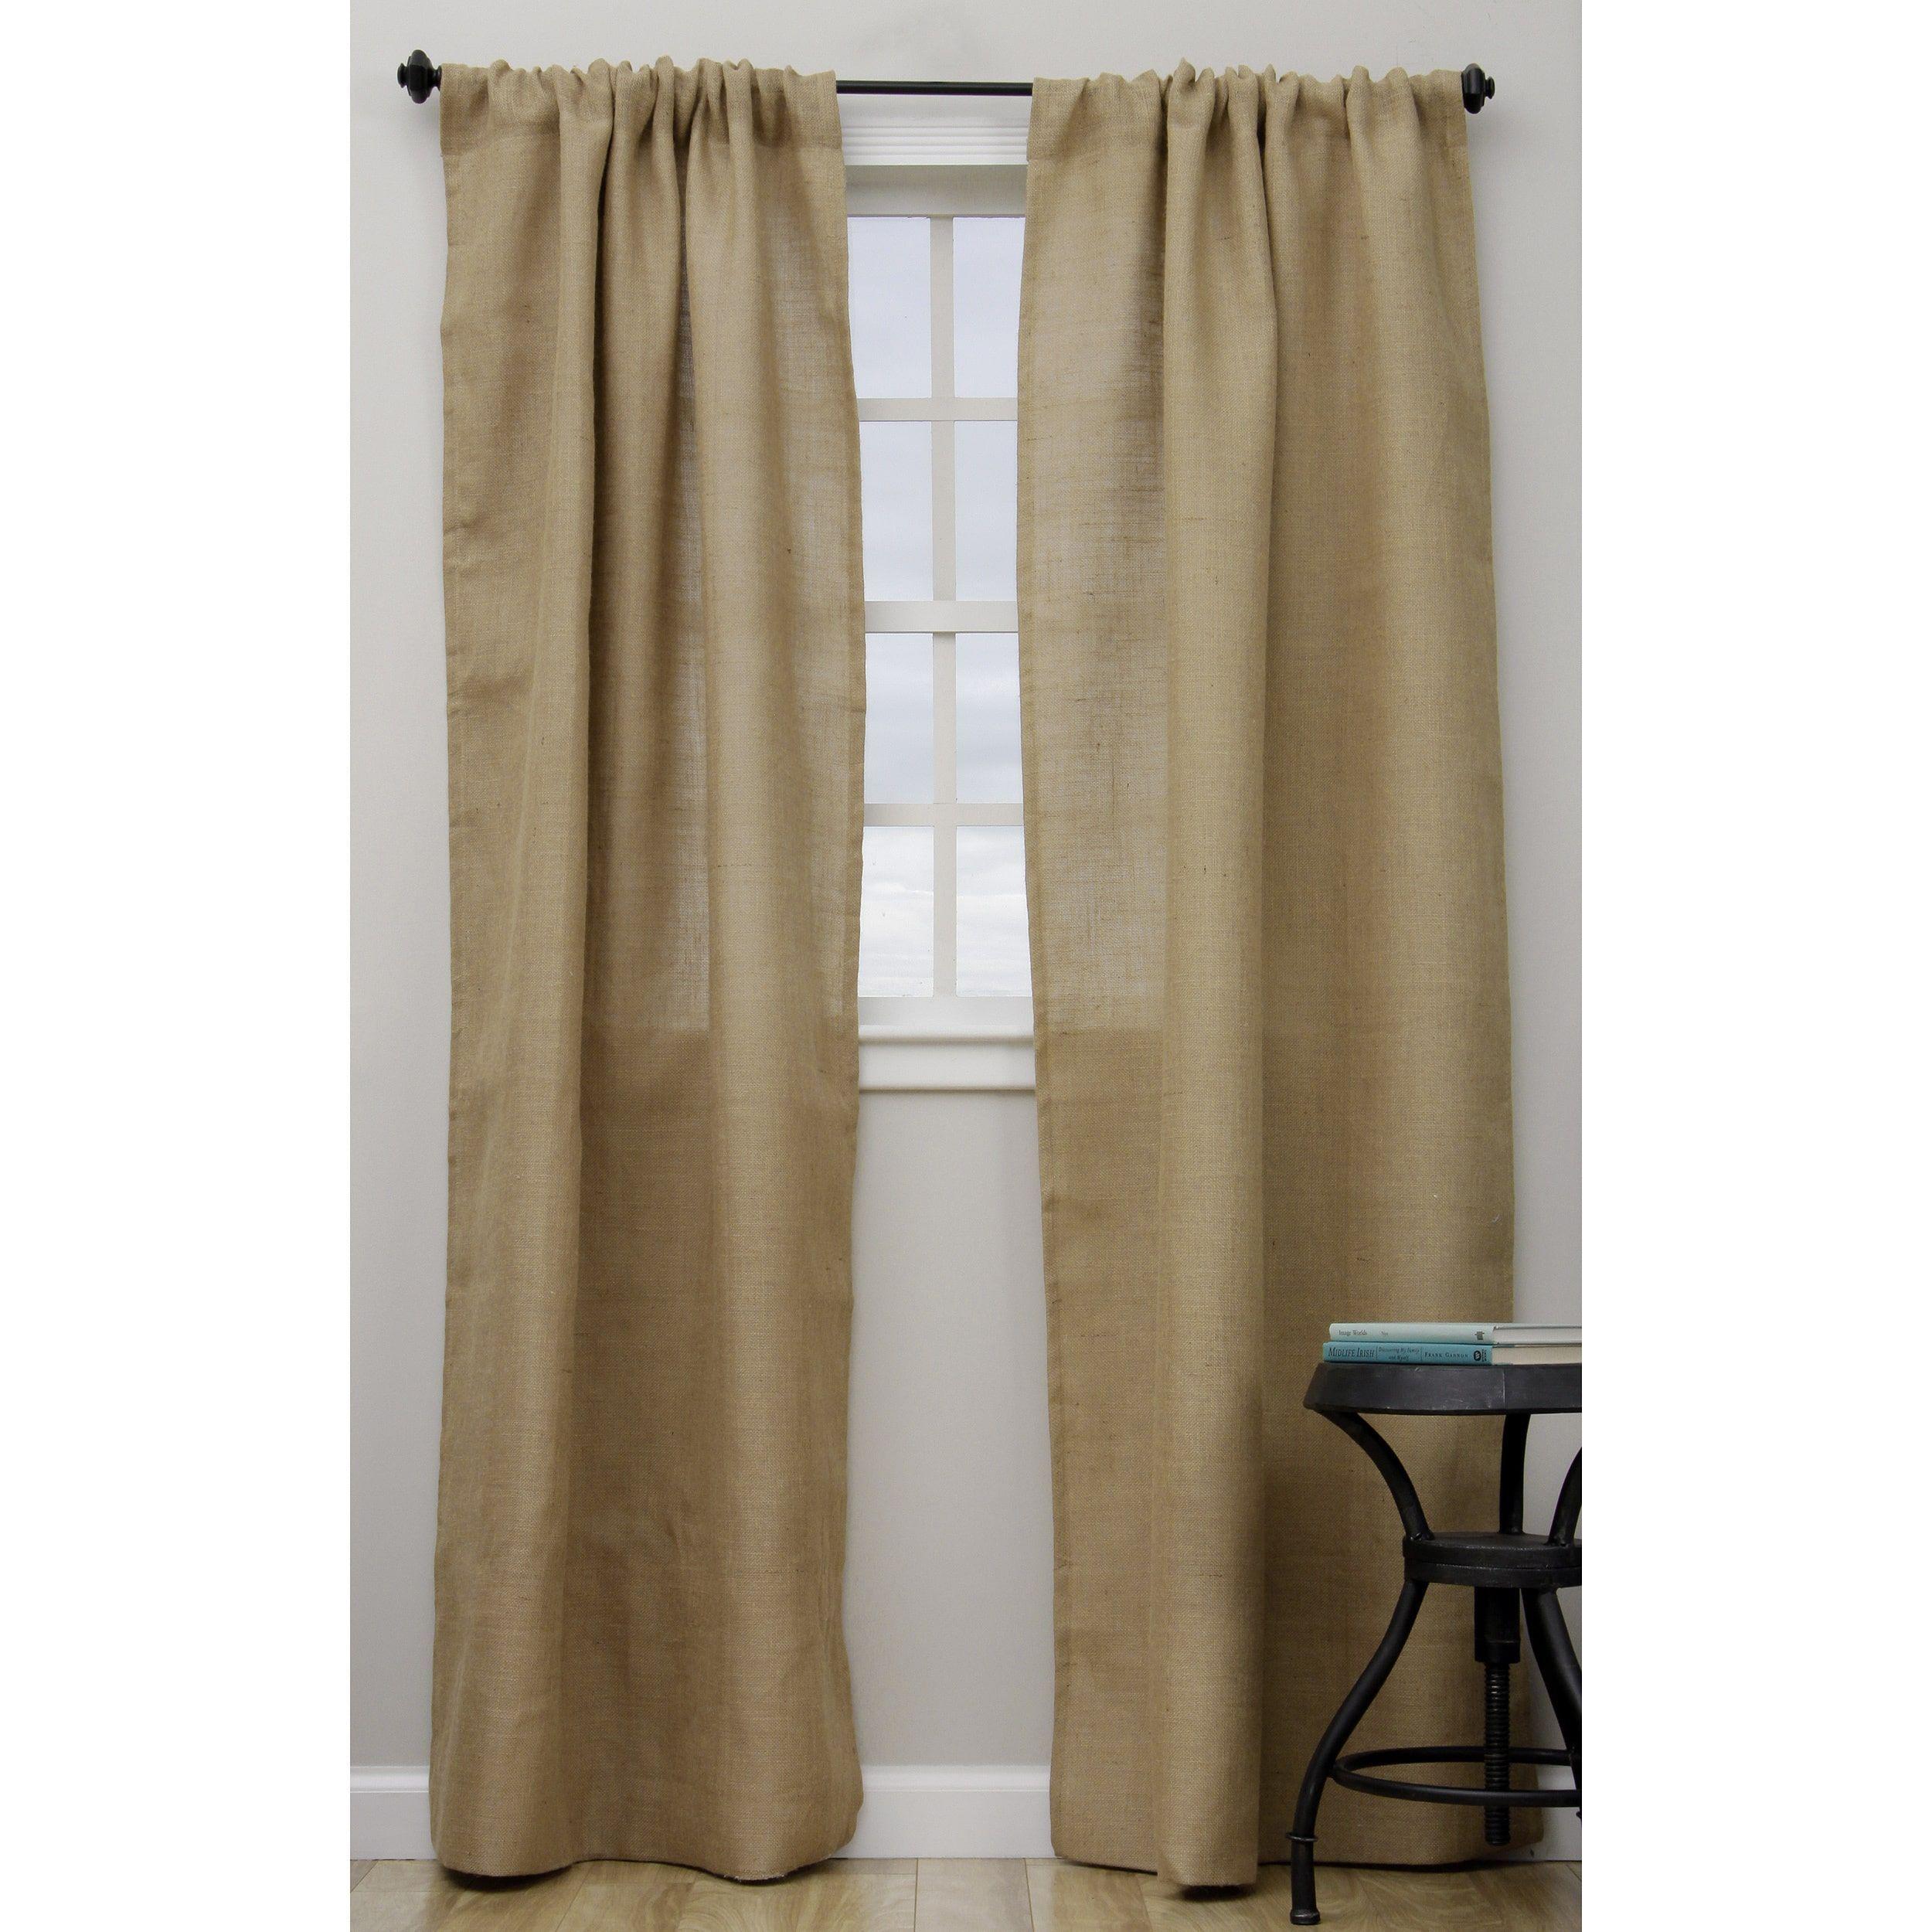 Open Weave Burlap Unlined Curtain Panel Natural 42 X 84 84